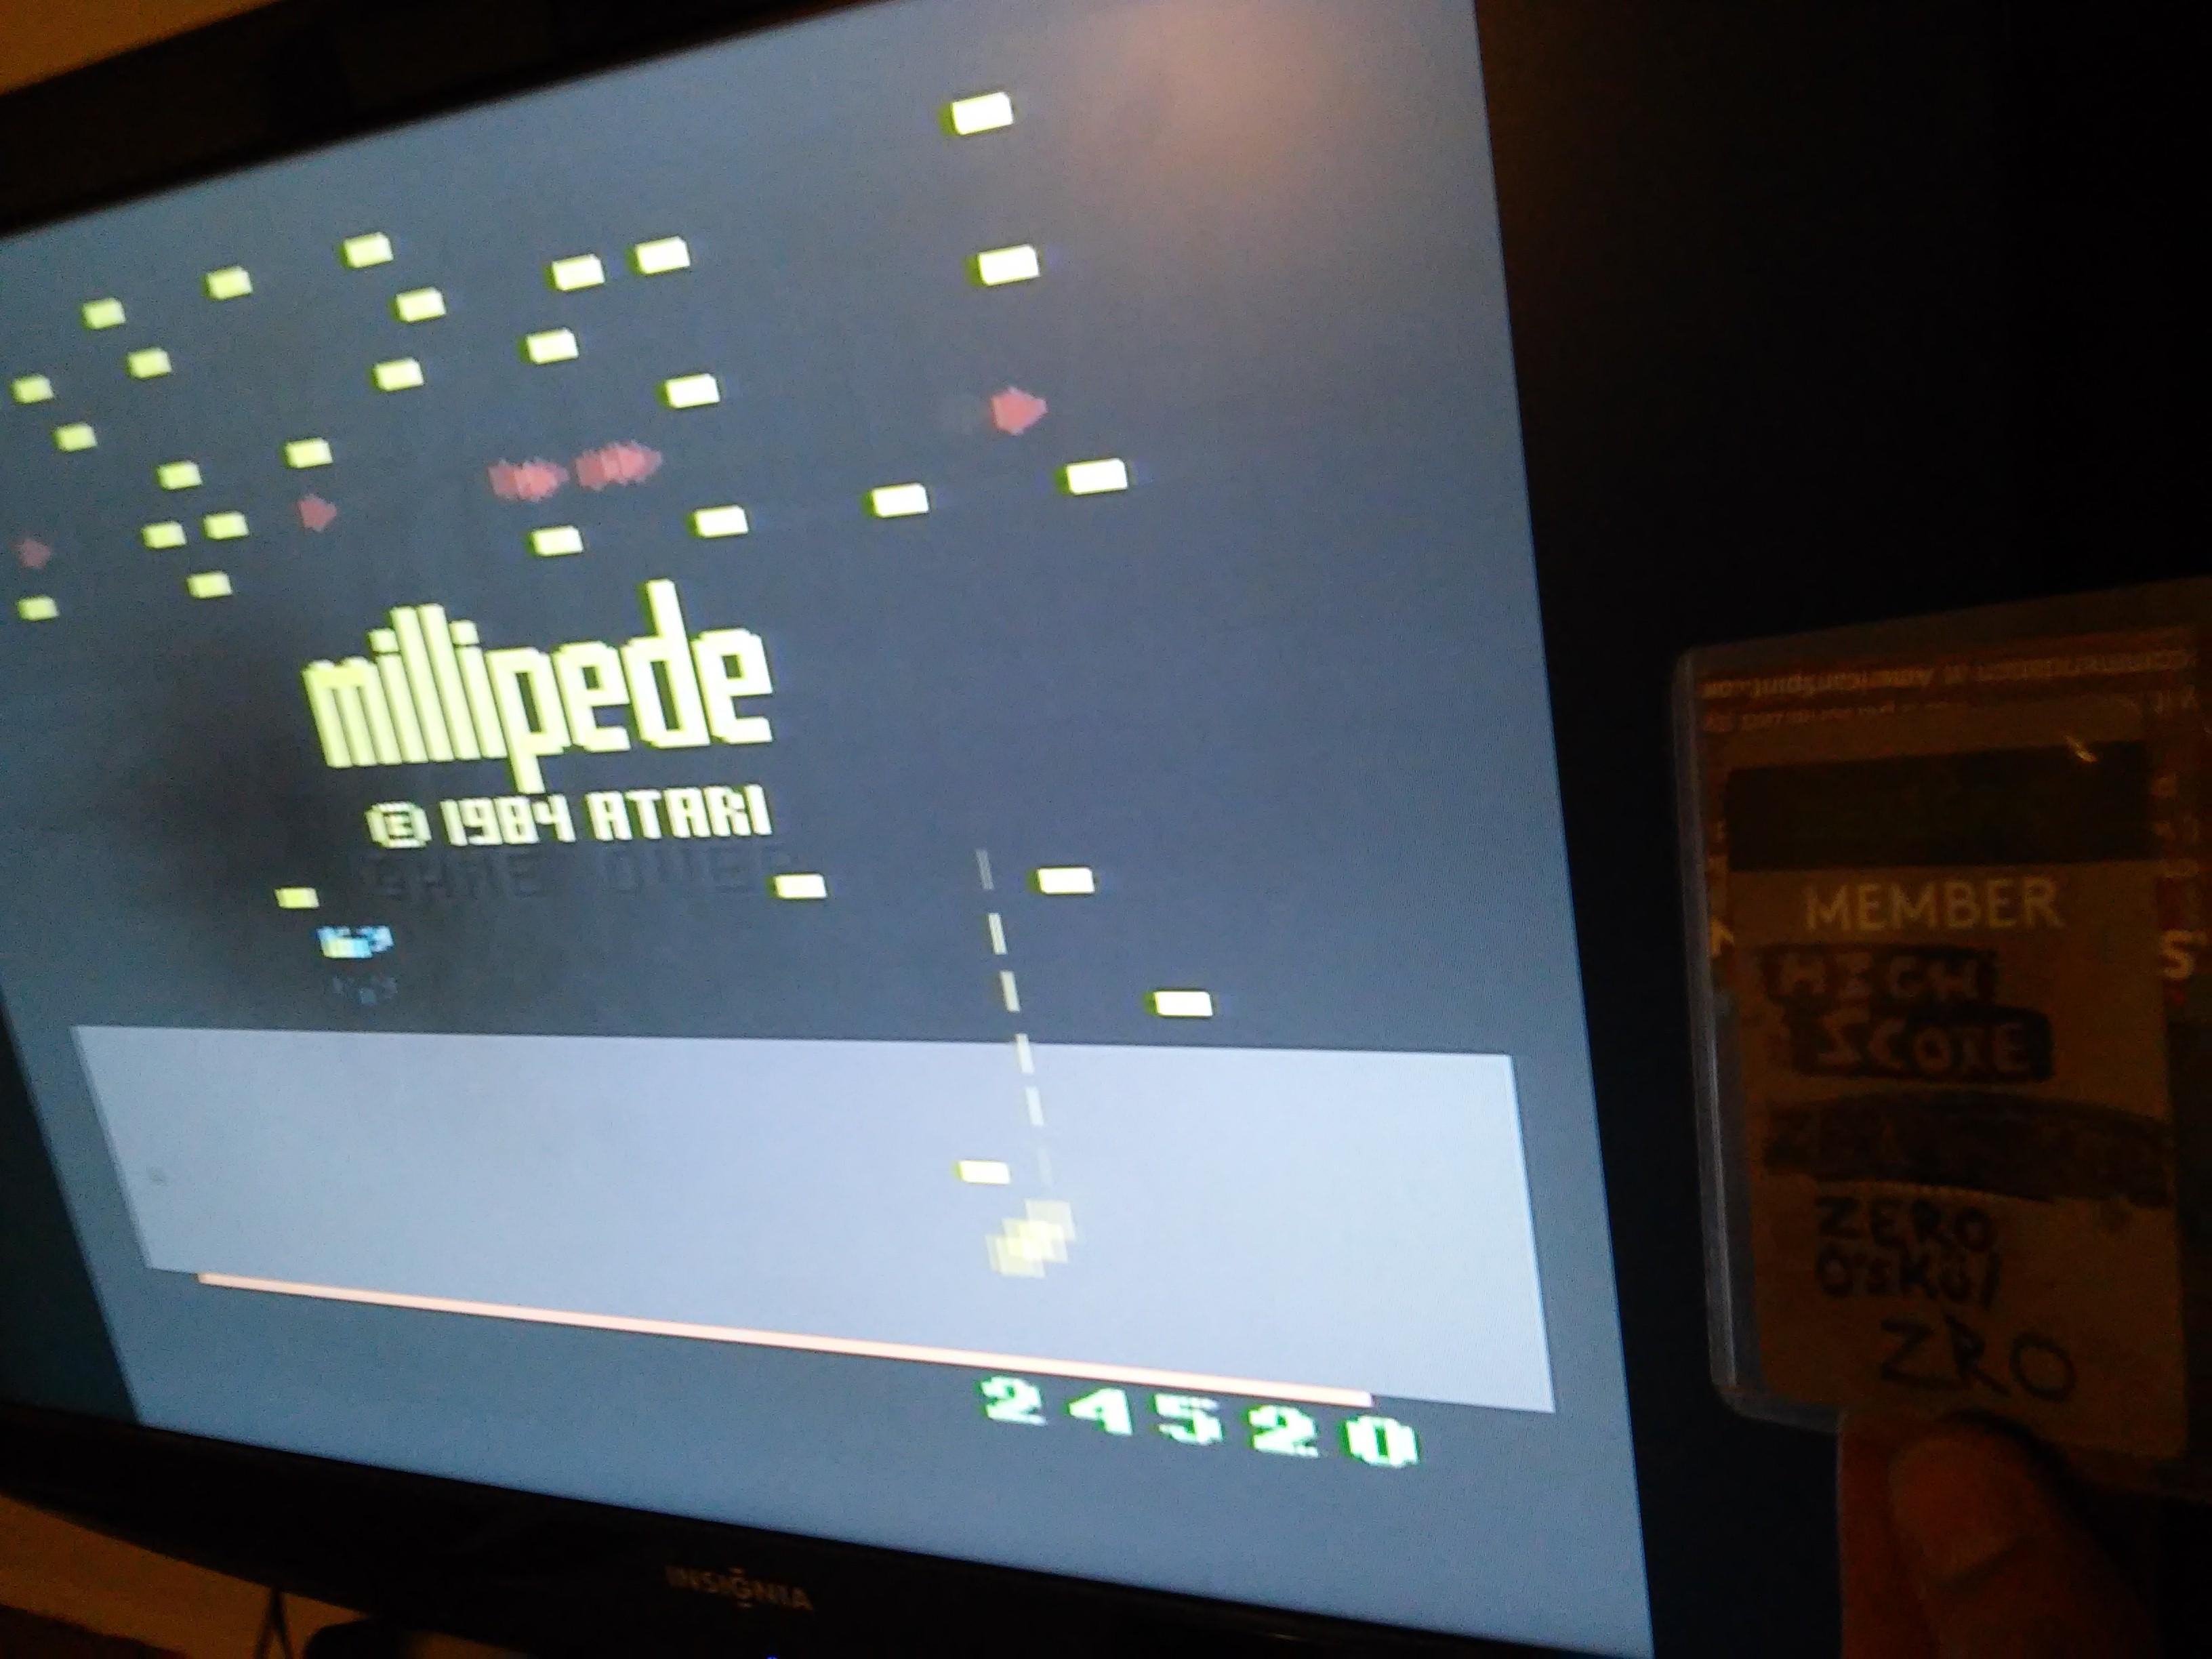 Millipede 24,520 points